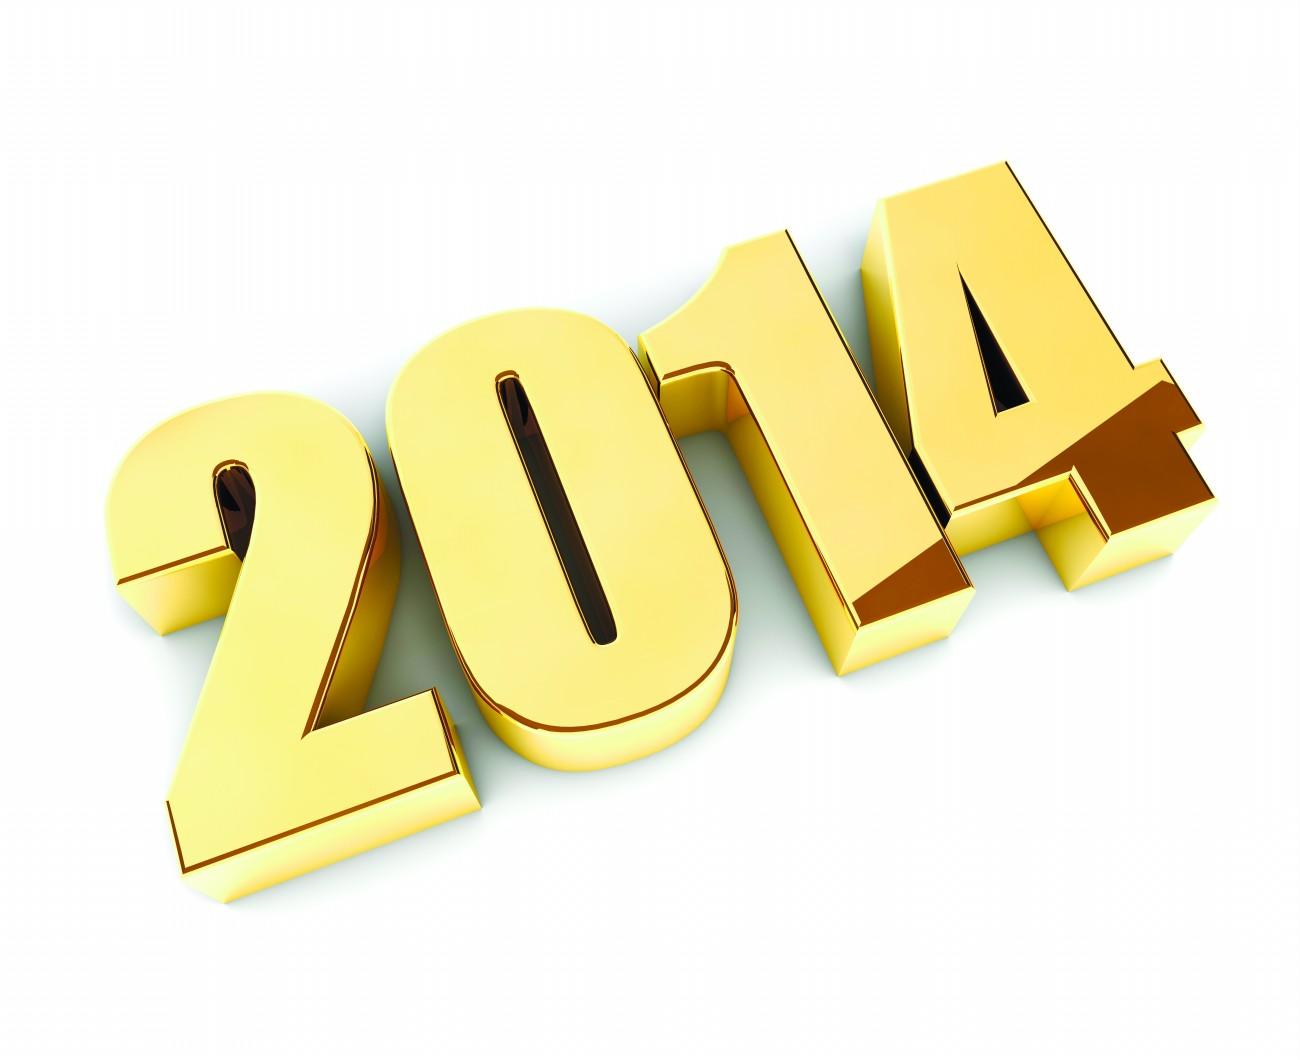 2014 >> 2014 New Year New Start New Look Maskell Associates